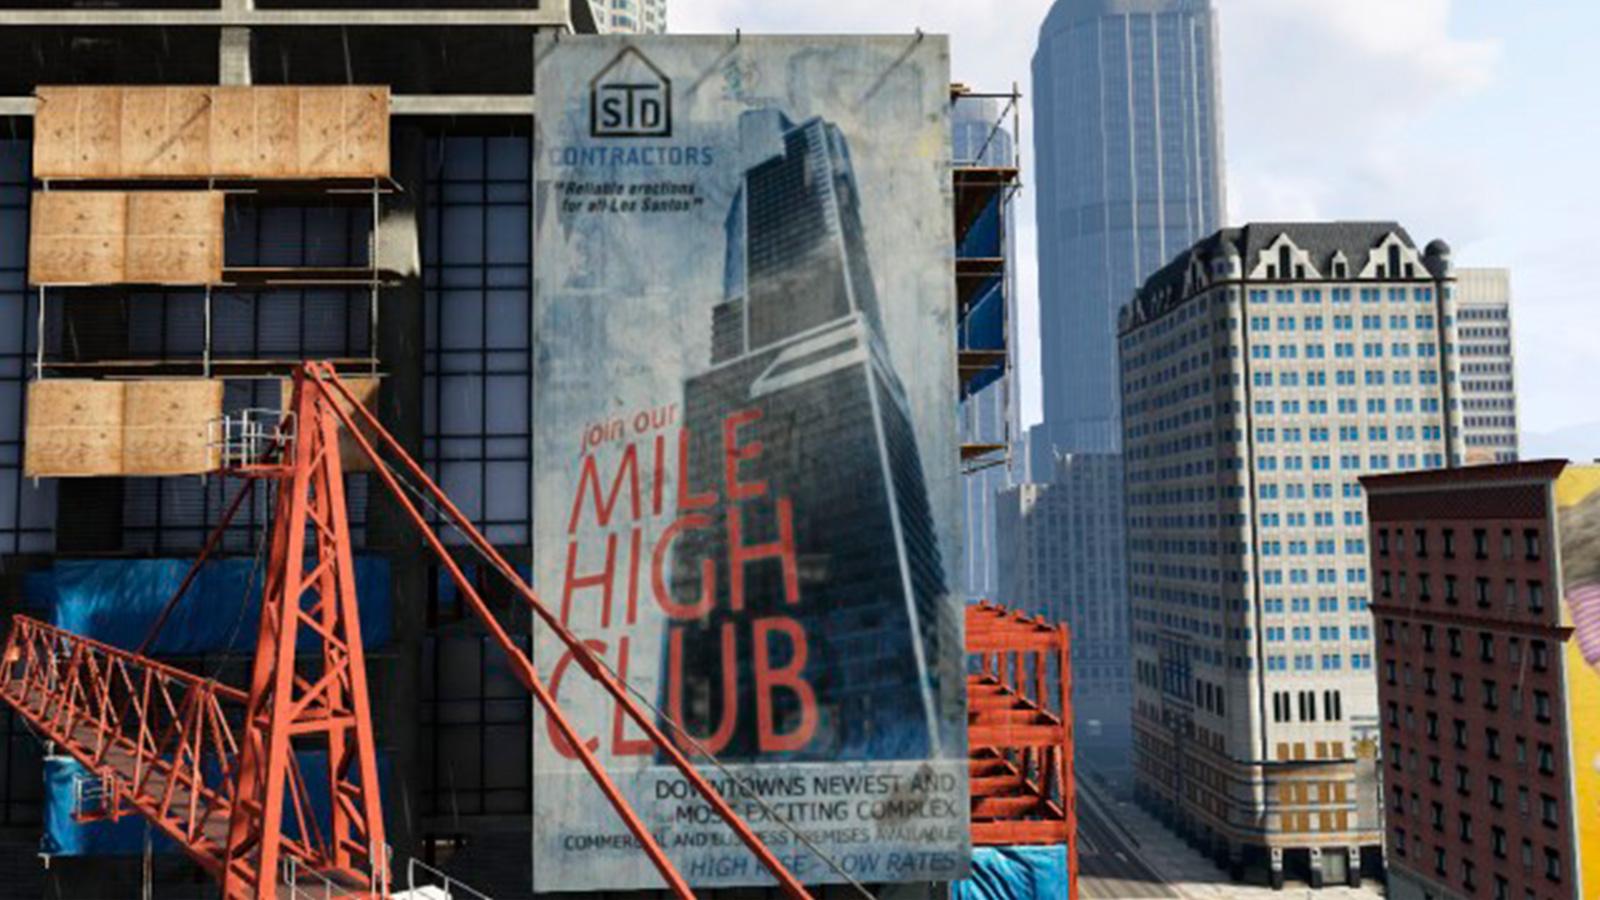 Игроки сделали из бесконечной стройки здания в GTA 5 символ ожидания GTA 6